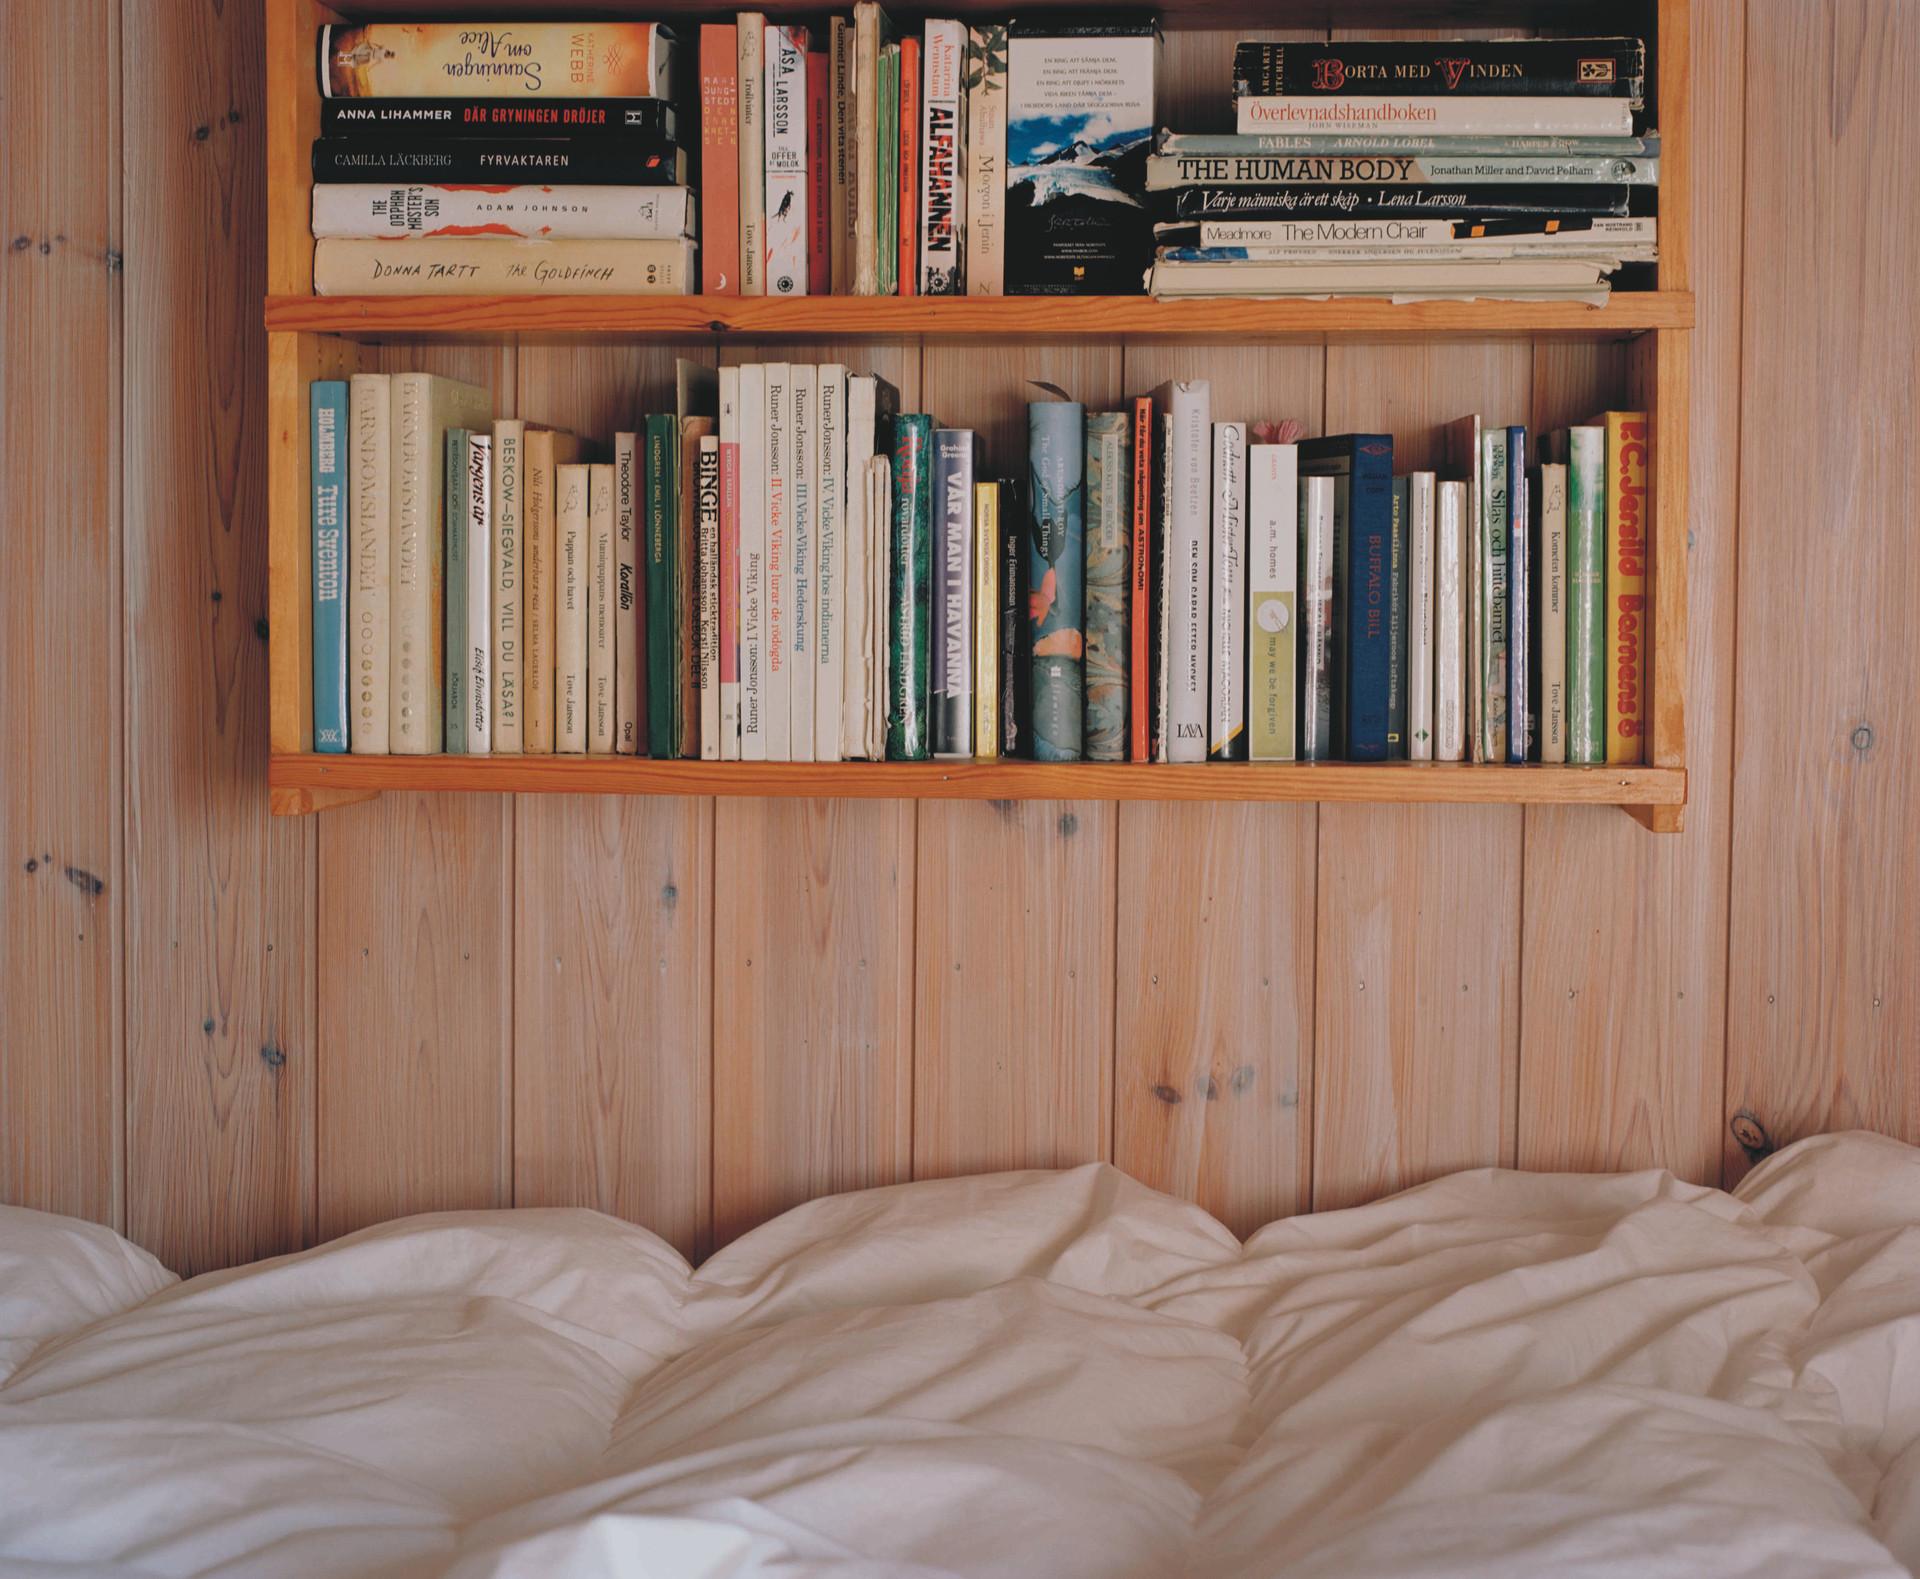 book shelf and bed.jpg